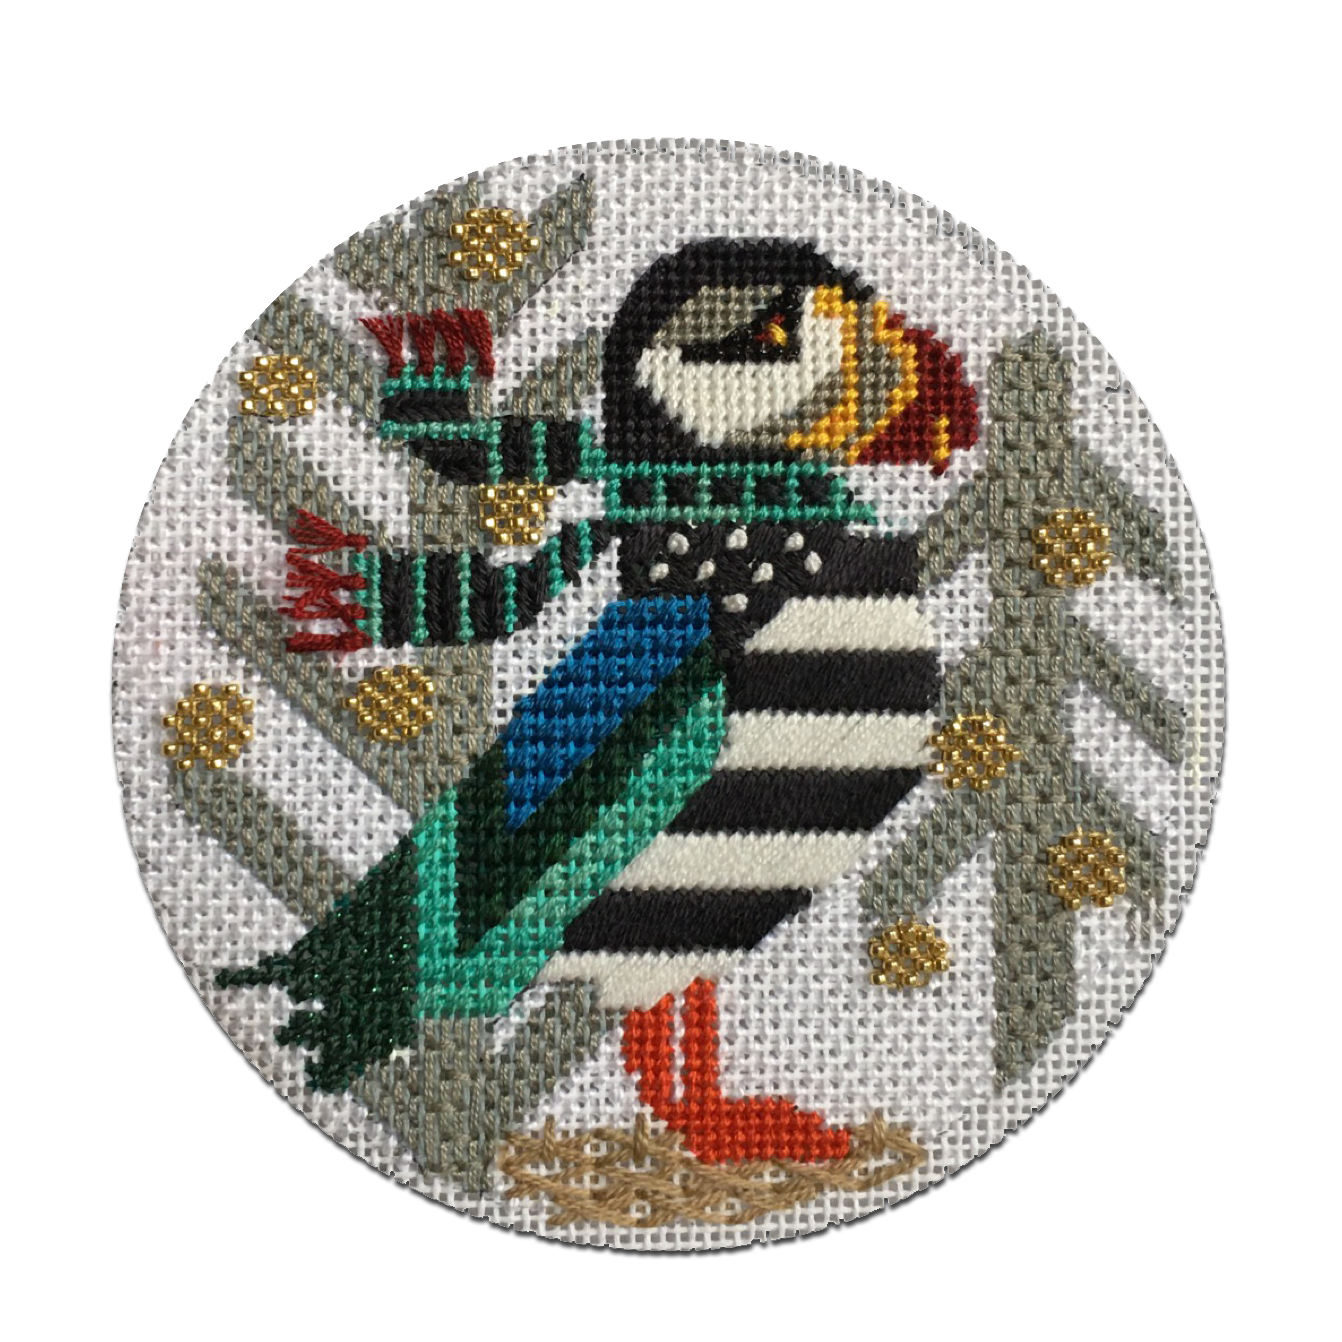 Puffin stitched by Janeann Sleeman - Design by Melissa Prince